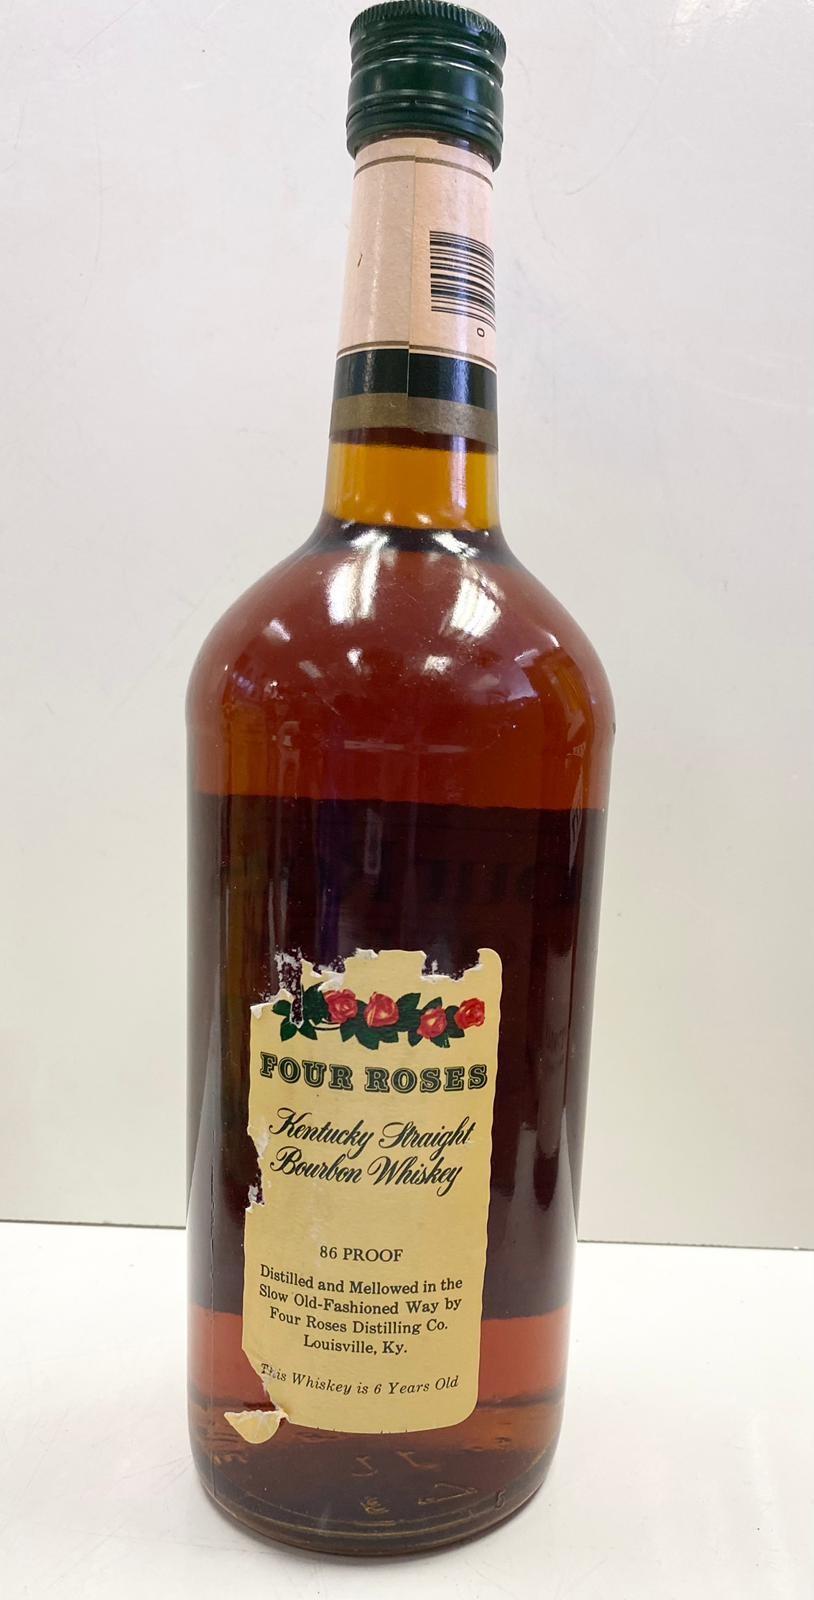 Four Roses Original Bourbon Whiskey. 100cl, 40% Vol. - Image 2 of 2